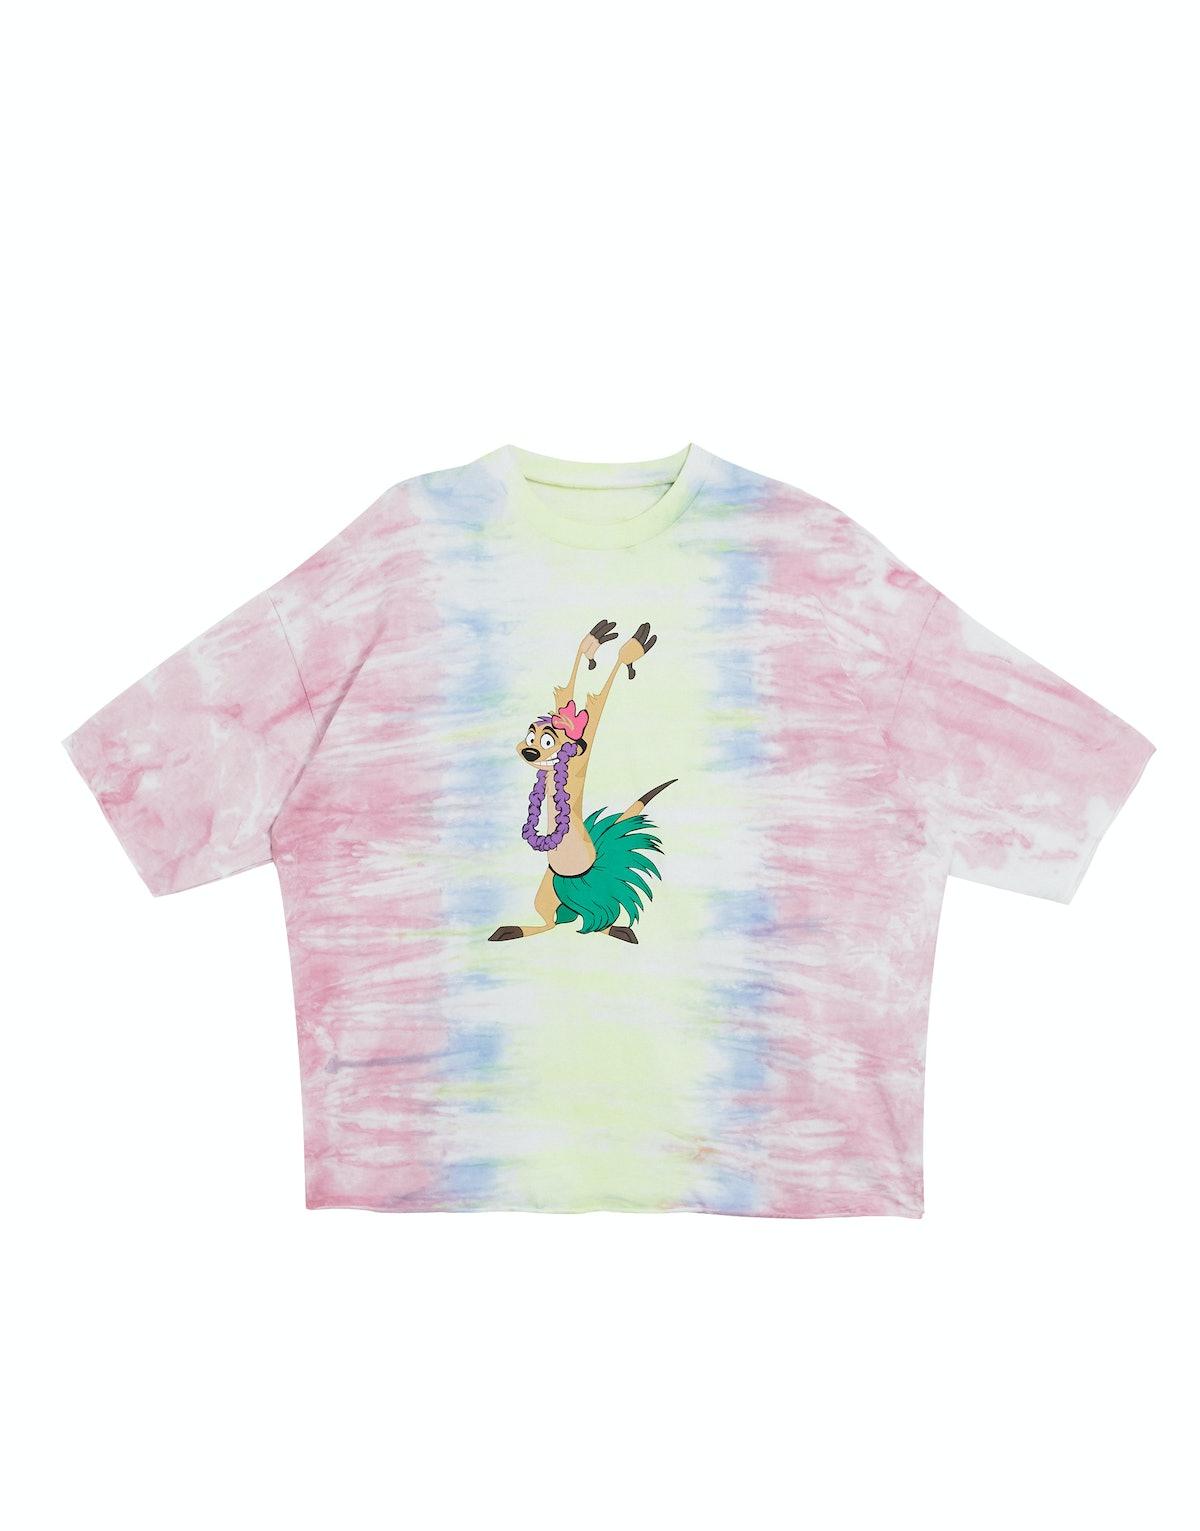 Oversized T-Shirt in Tye Dye Timon Print